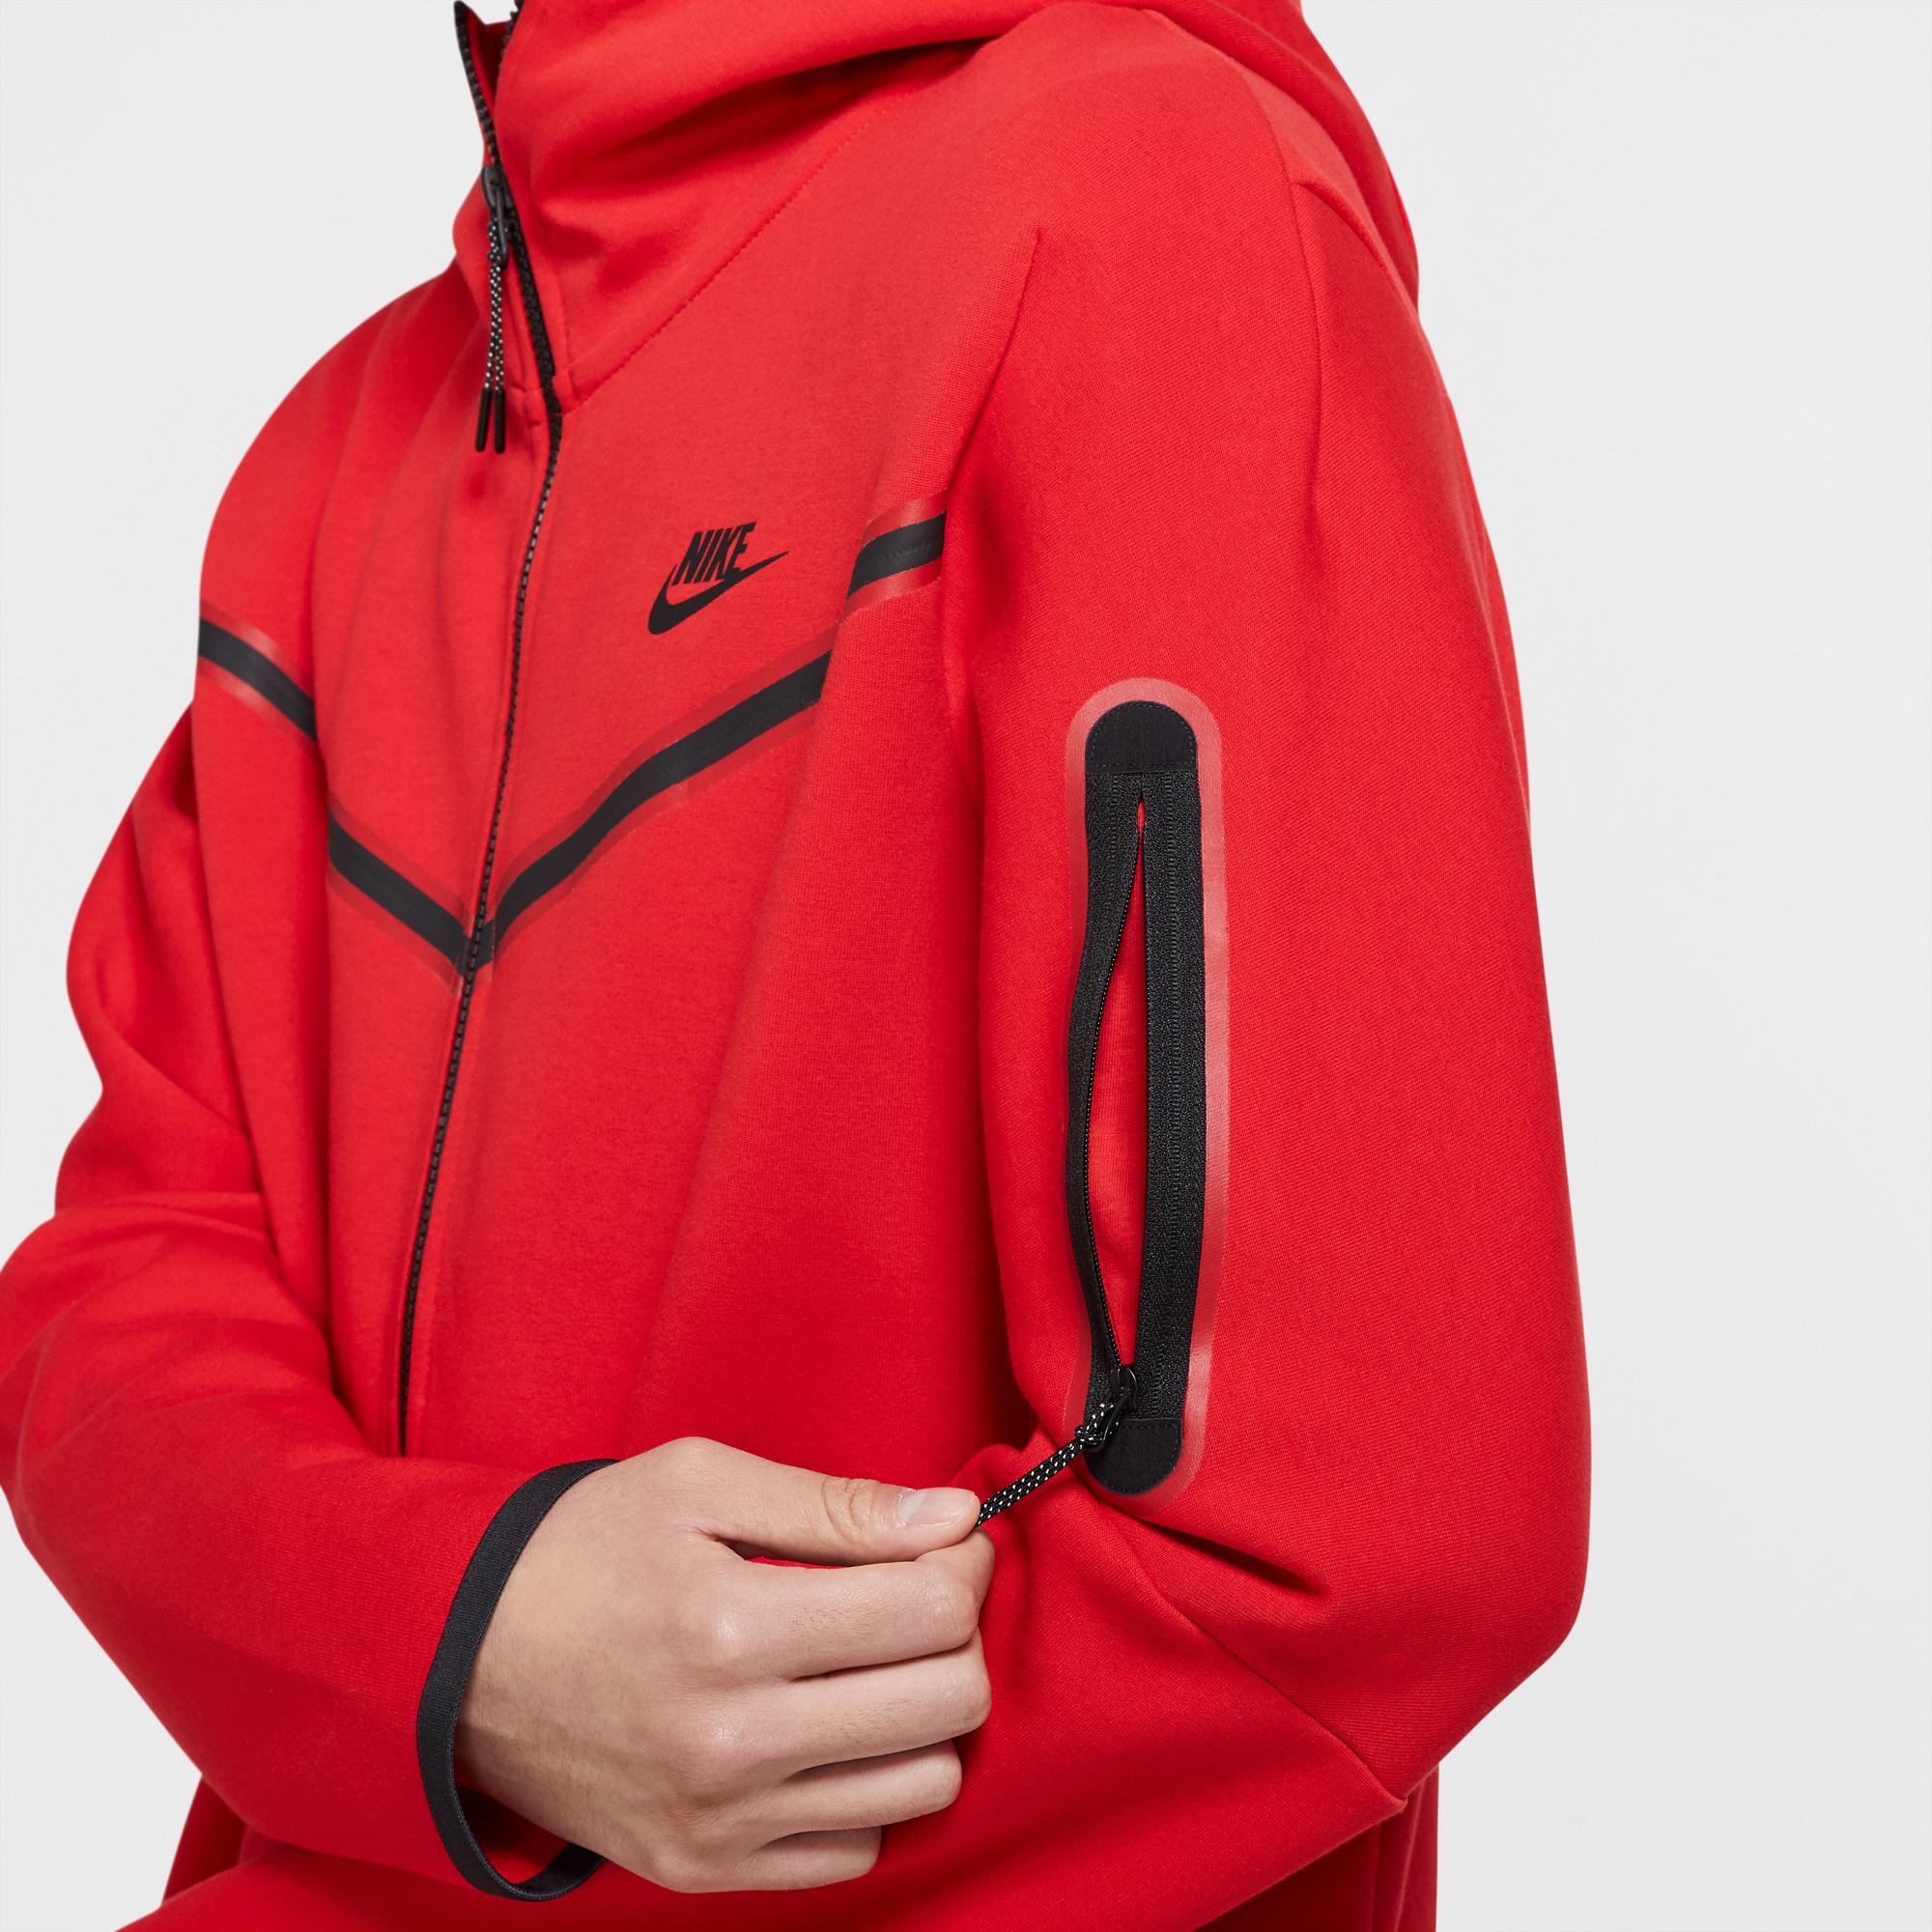 Nike Sportswear Erkek Kırmızı Sweatshirt